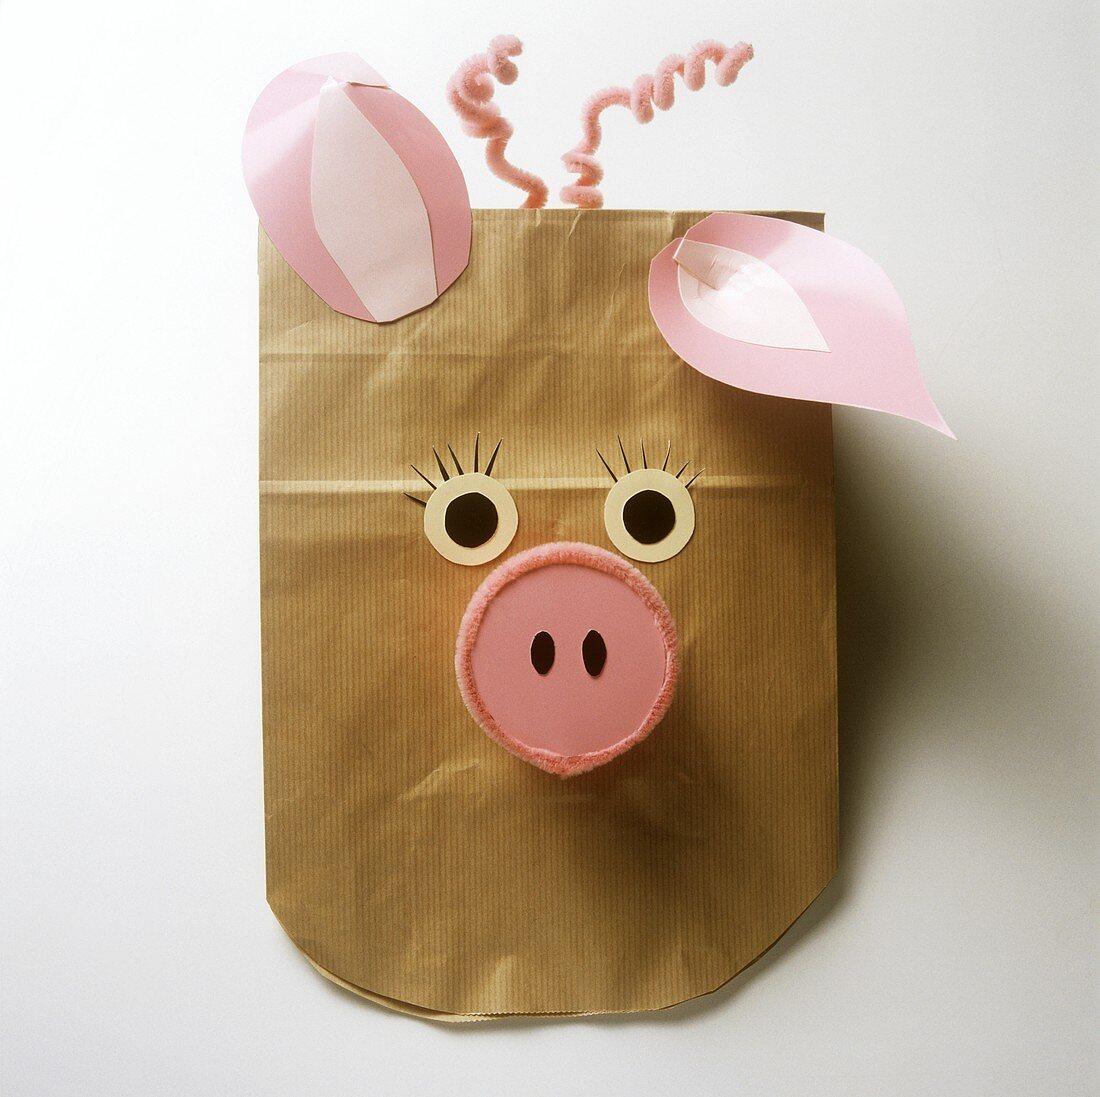 Paper animal masks for children's party: pig